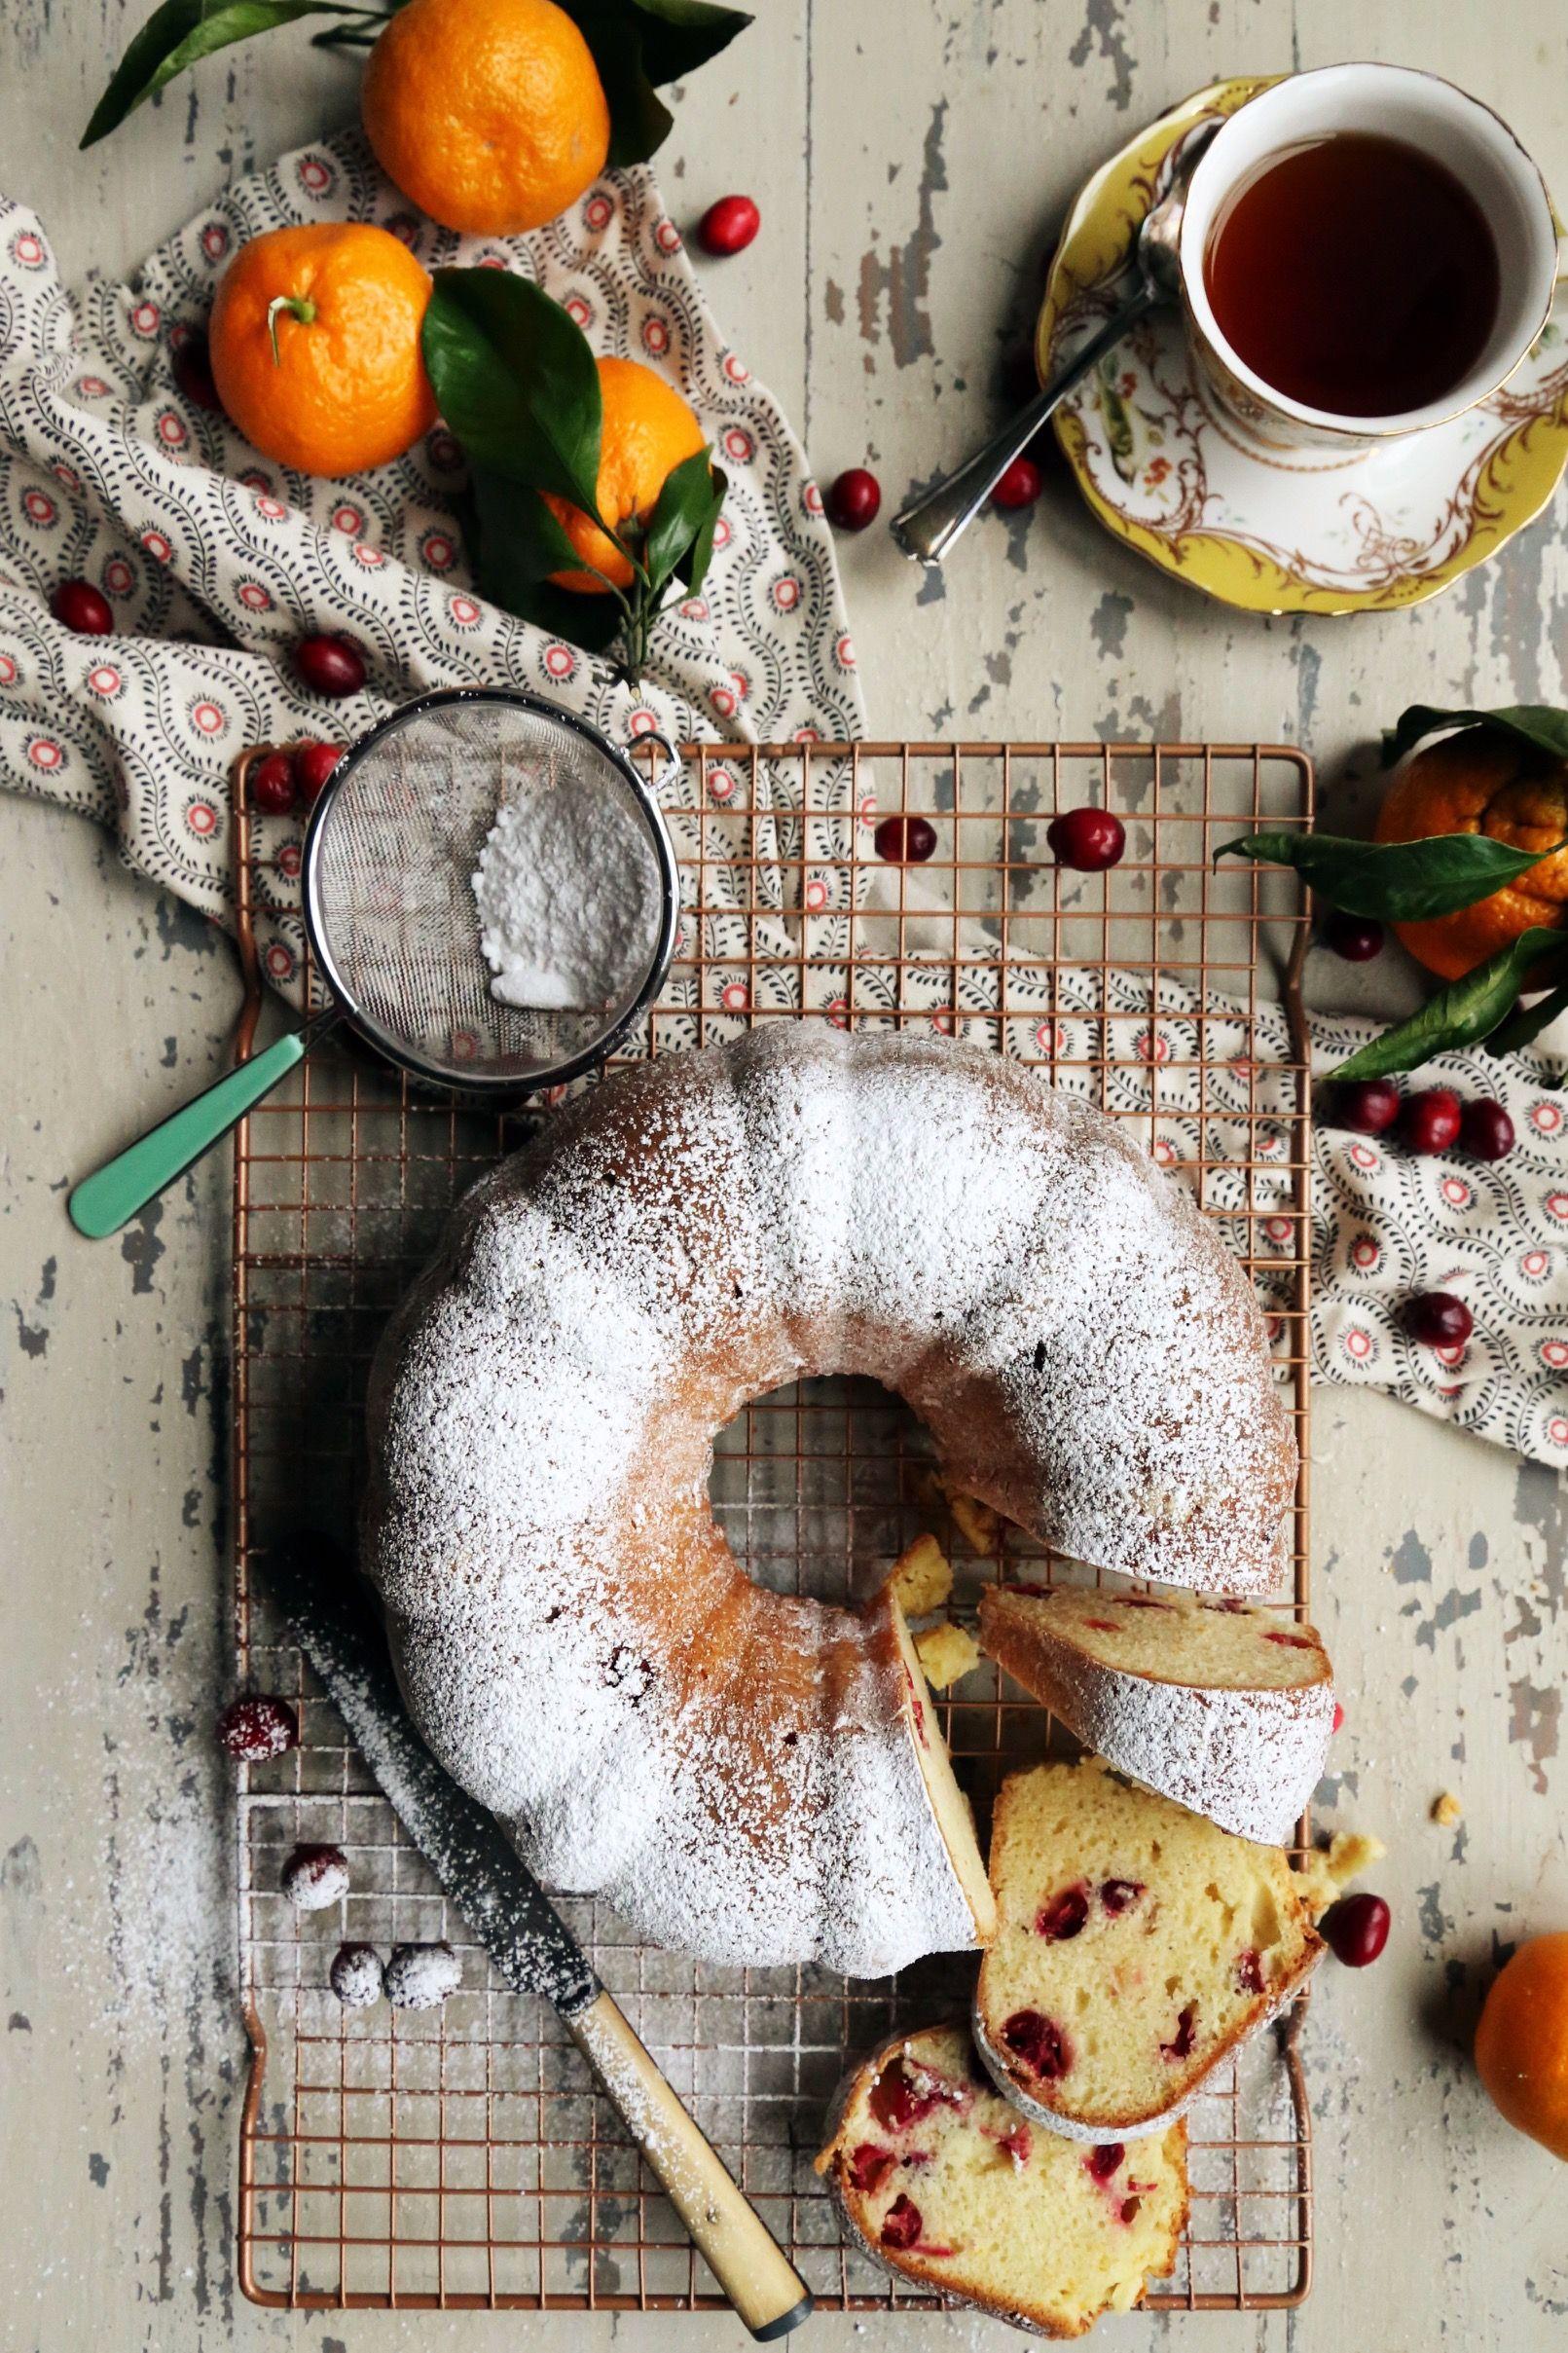 Cranberry Orange Sour Cream Bundt Cake Country Cleaver Recipe Bundt Cake Sour Cream Holiday Baking Recipes